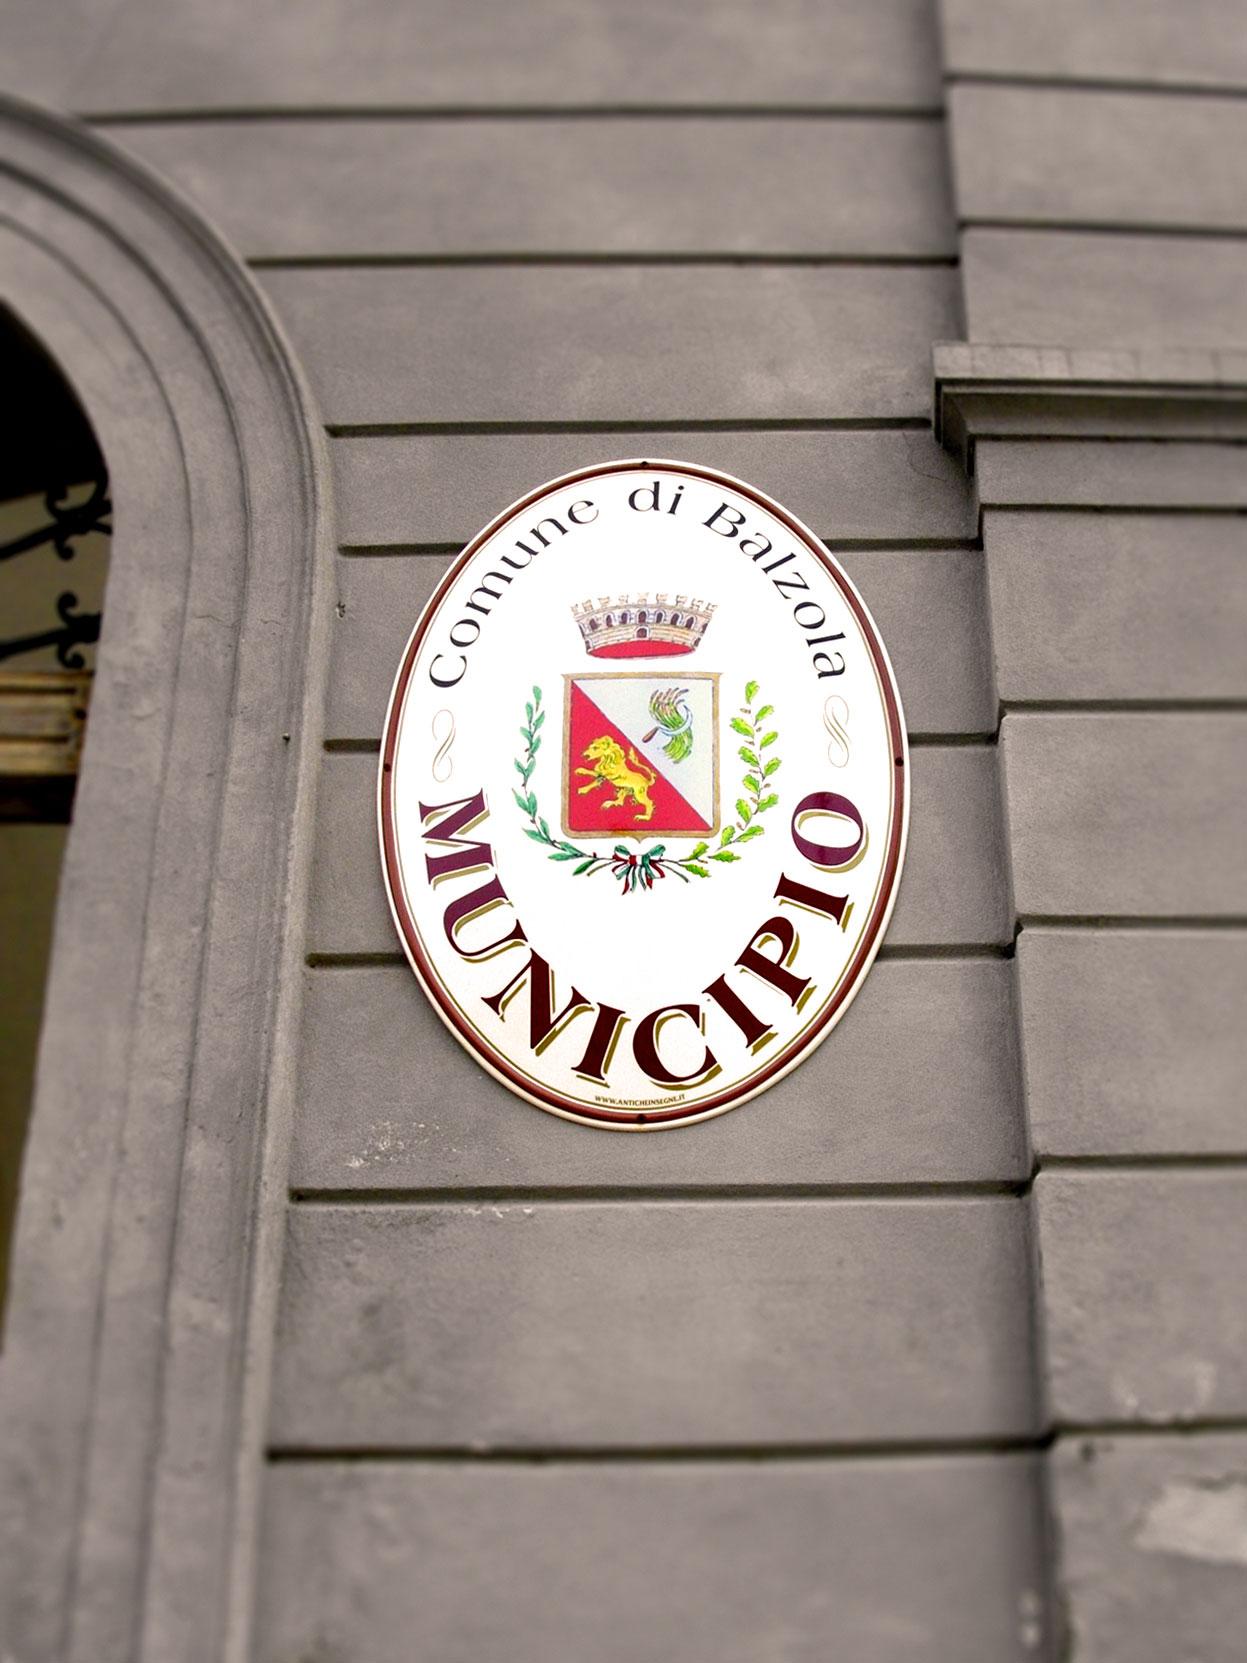 Municipio di Balzola